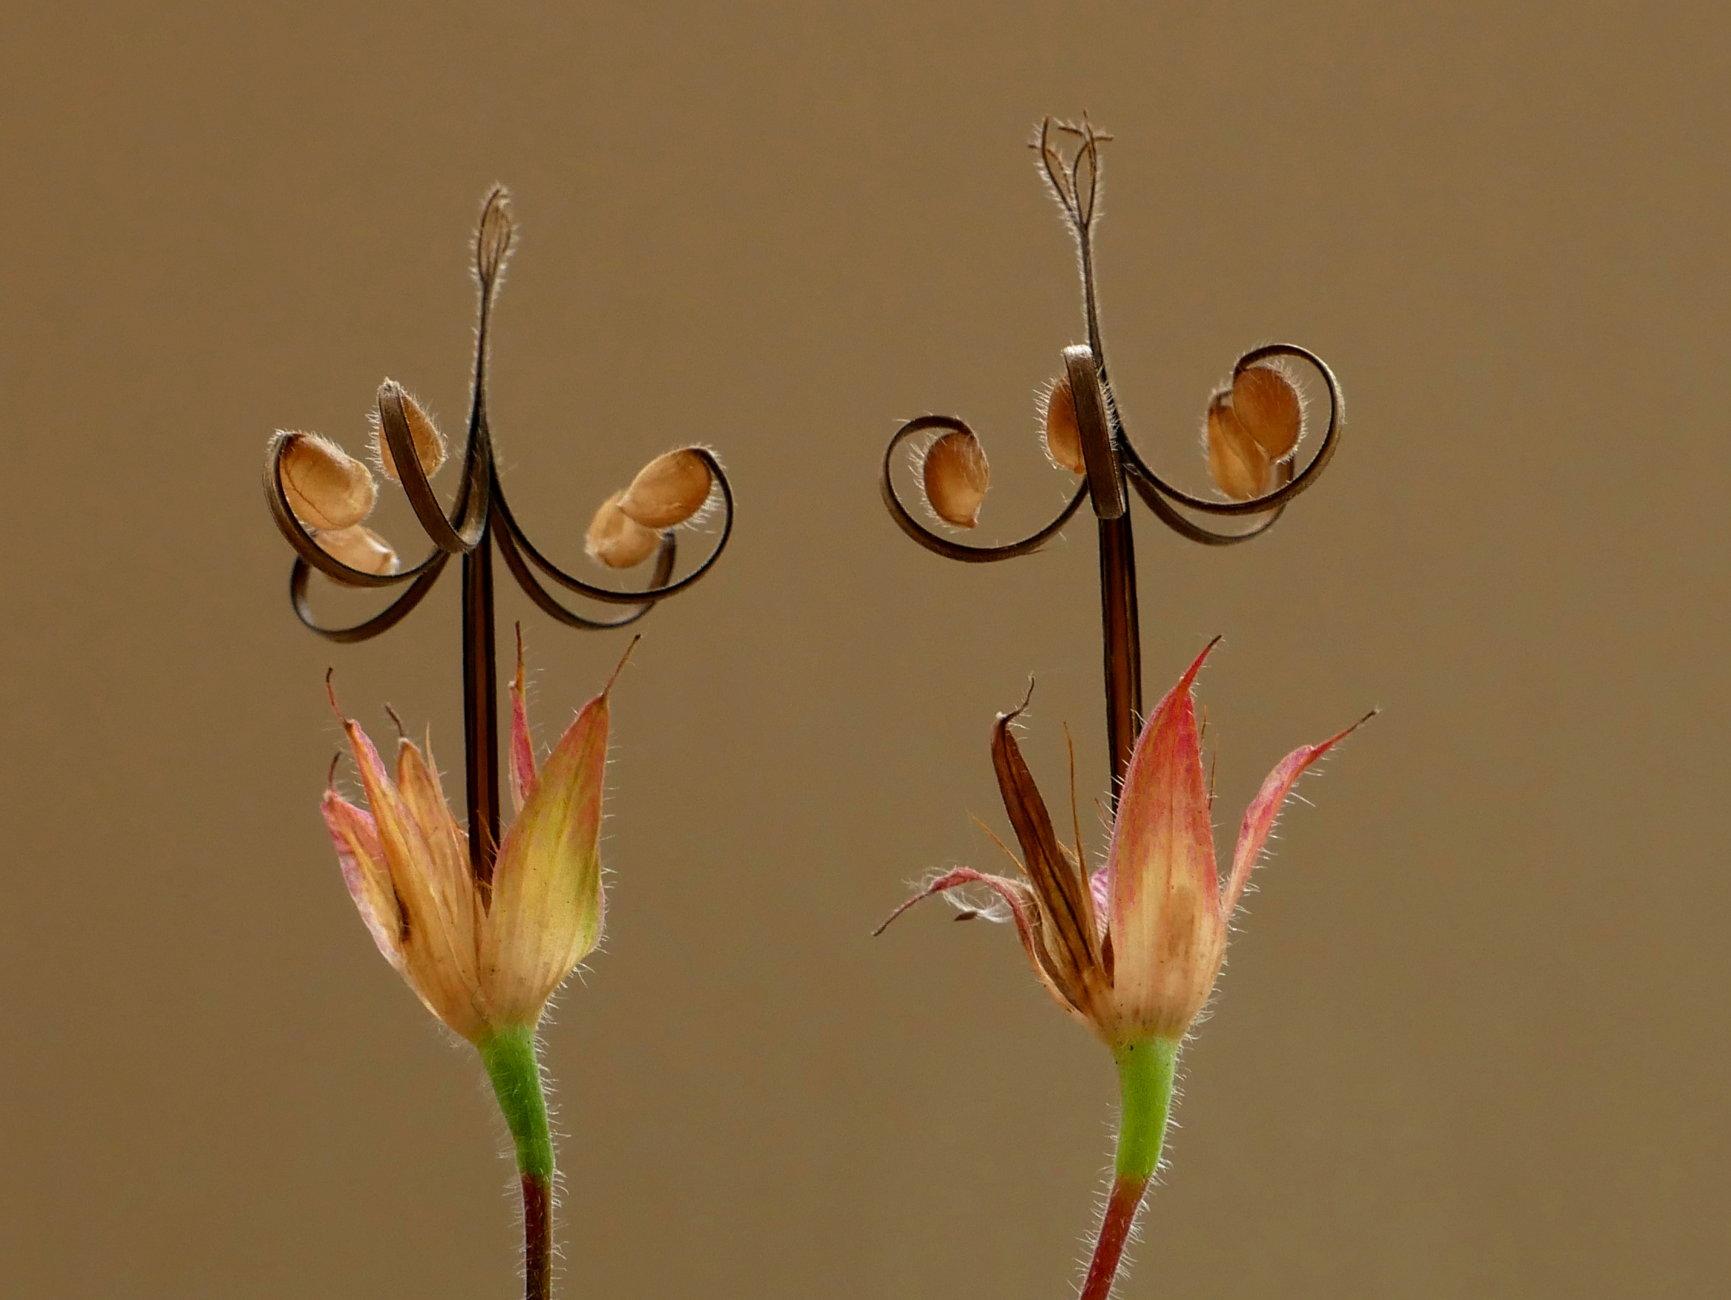 geranium seed heads